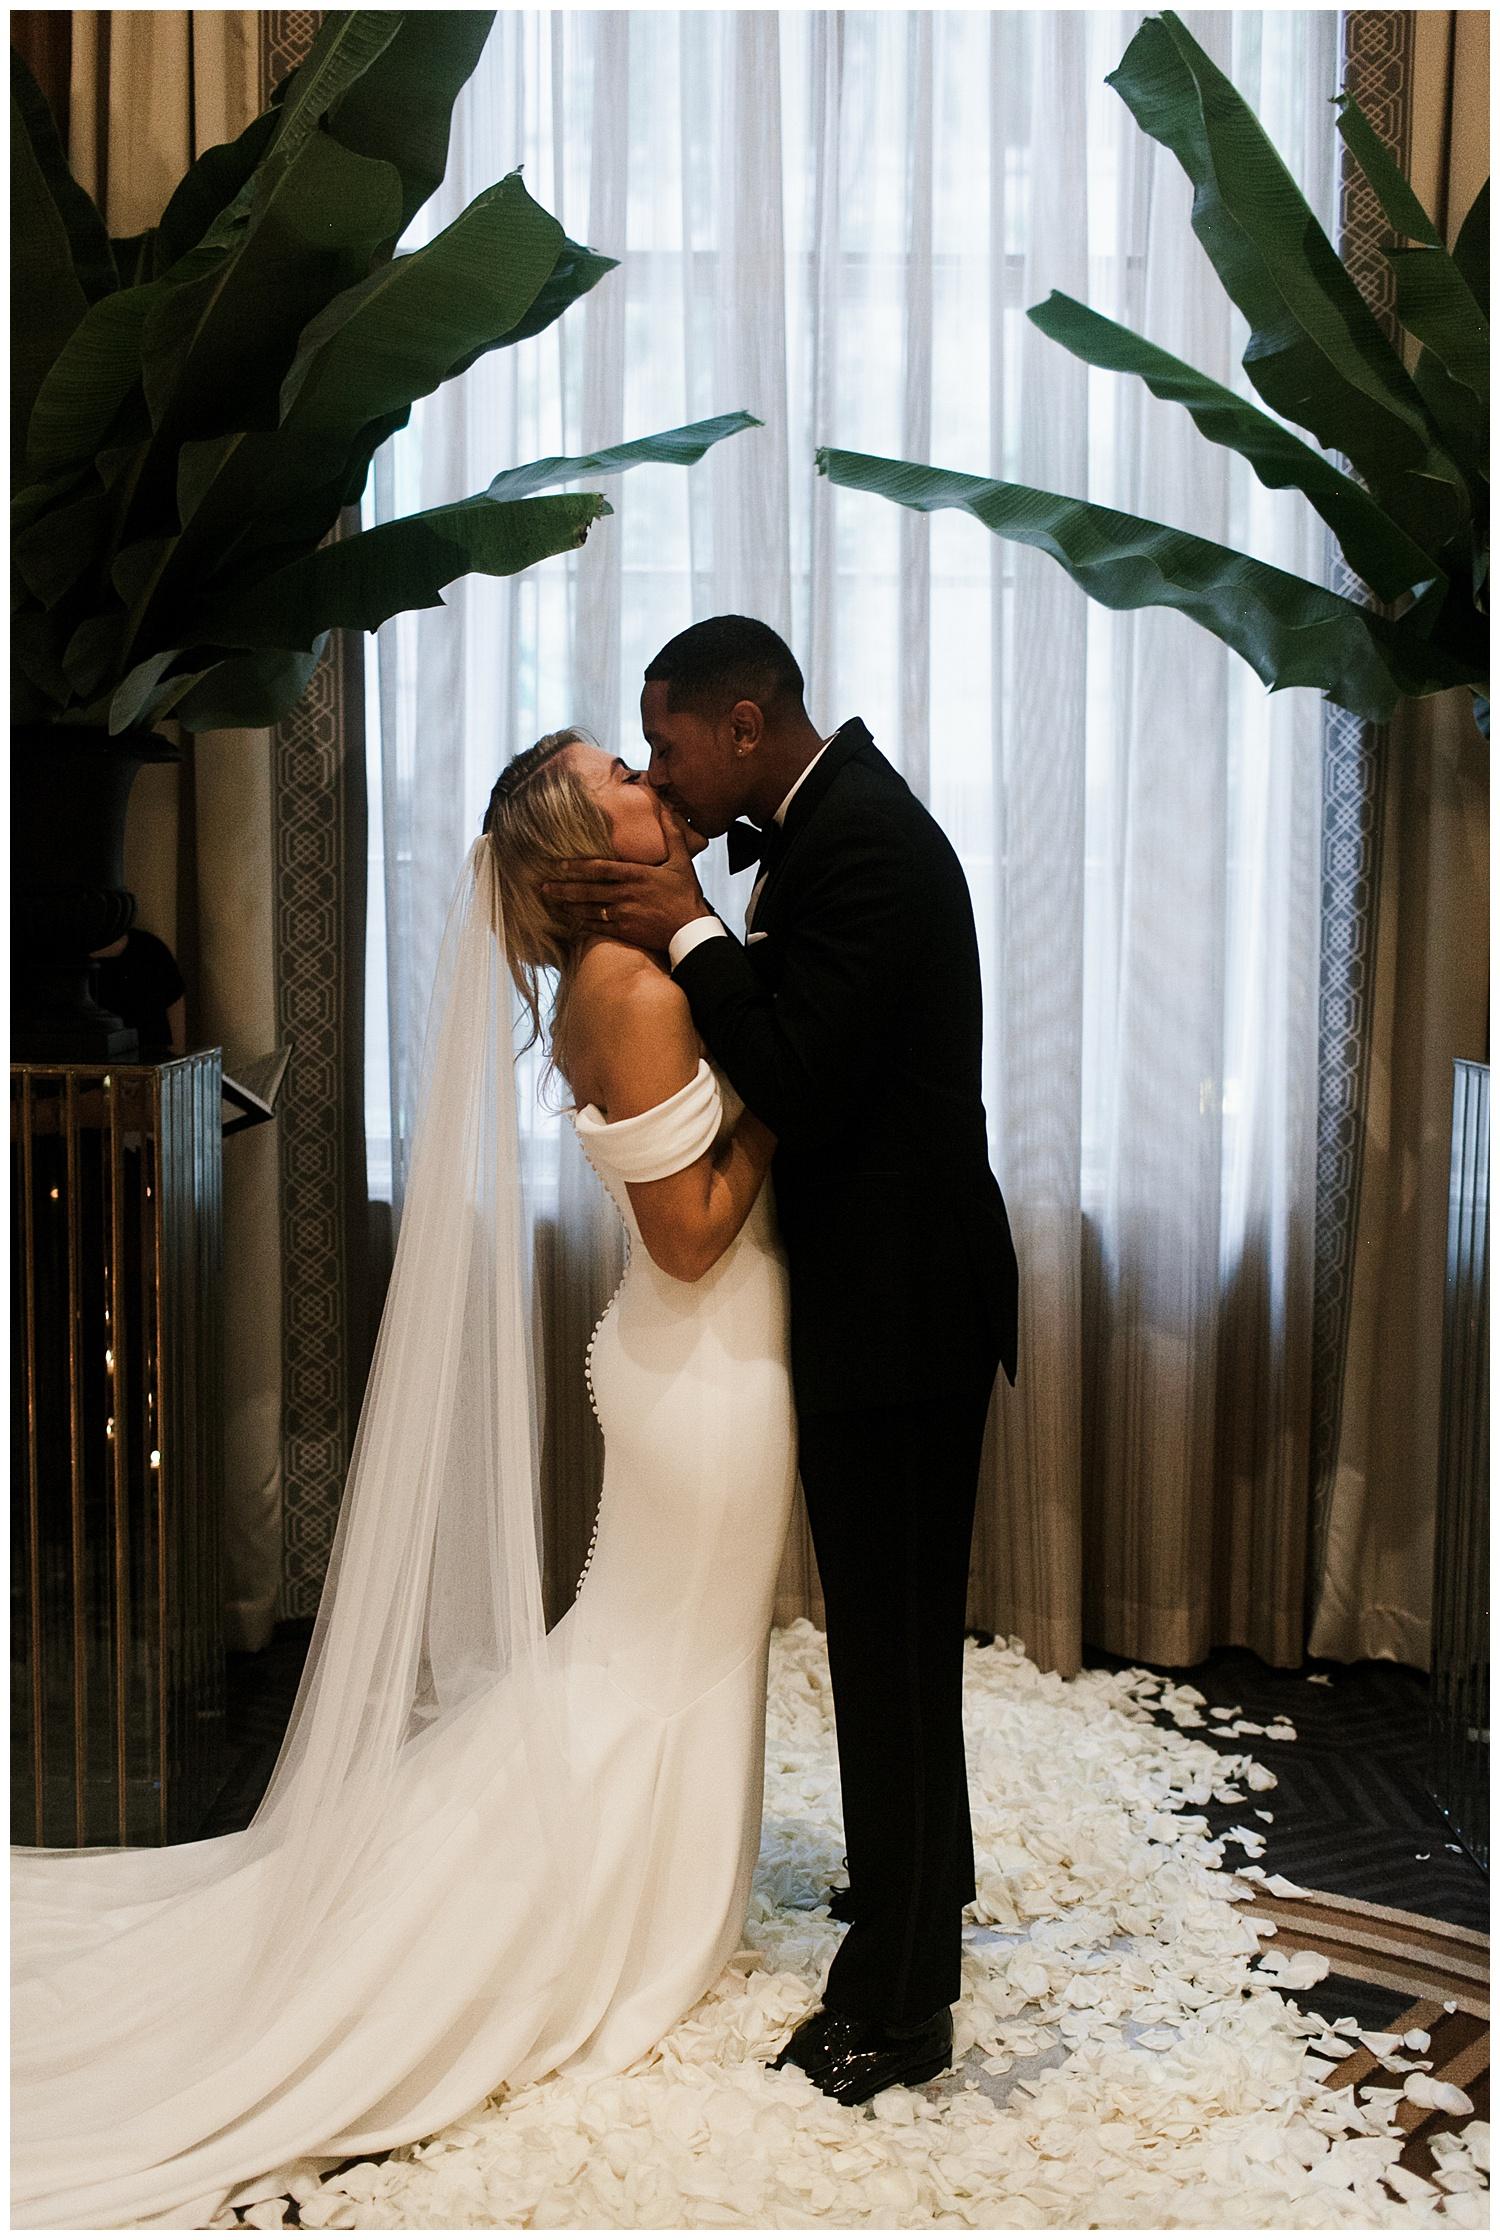 Fairmont Olympic Hotel Wedding_Elizabeth Zuluaga_Taylor & Caton_061.jpg